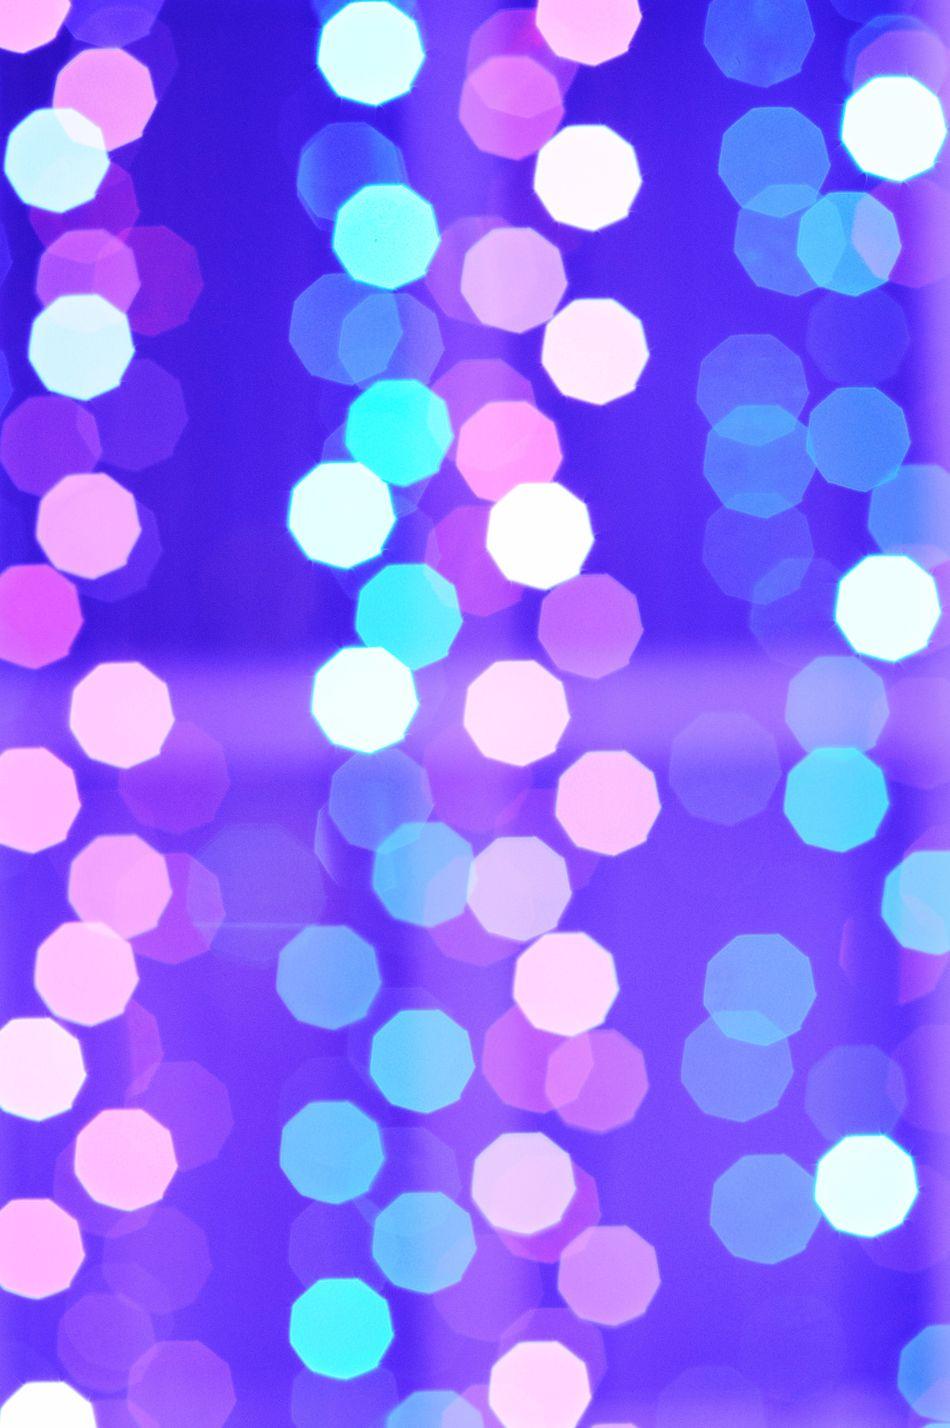 Christmas Lights Christmastime Blurry Purple Blue Lights Colourful